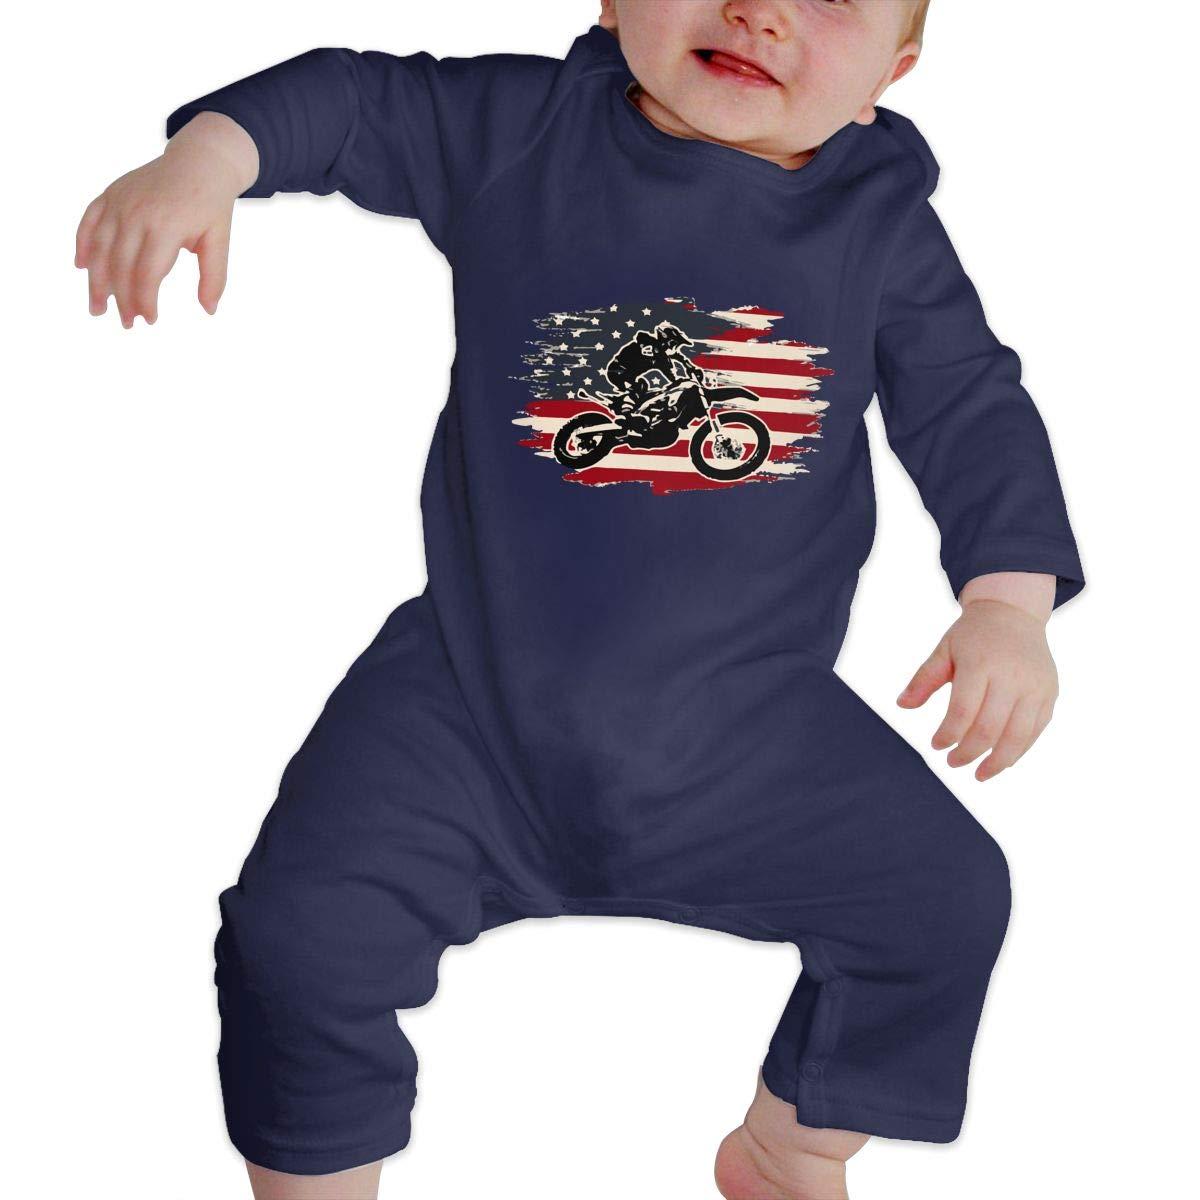 Q64 Baby Boys Round Collar Dirt Bike Motocross American Flag Long Sleeve Pajamas Sleepwear 100/% Cotton Suit 6-24 Months